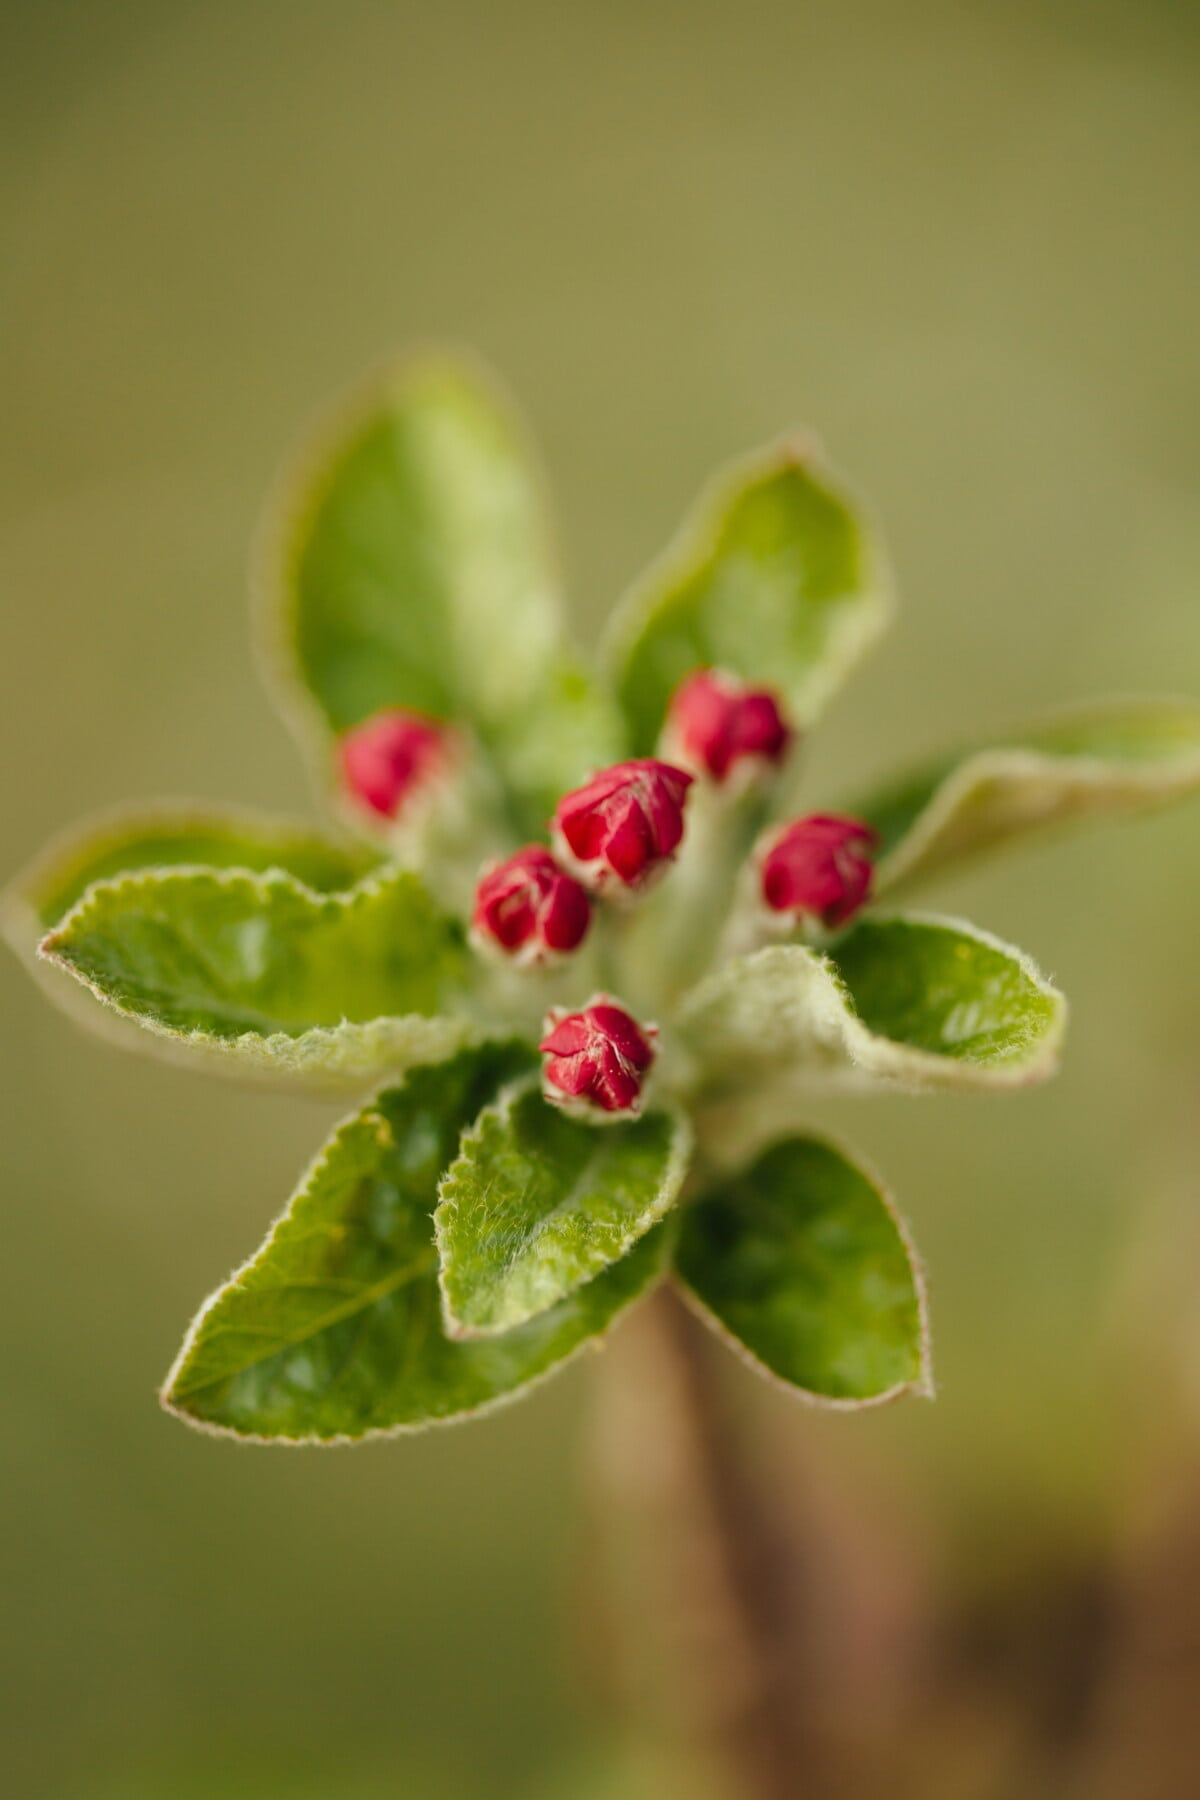 apple tree, fruit tree, red, flower bud, detail, botany, spring time, bud, plant, leaf